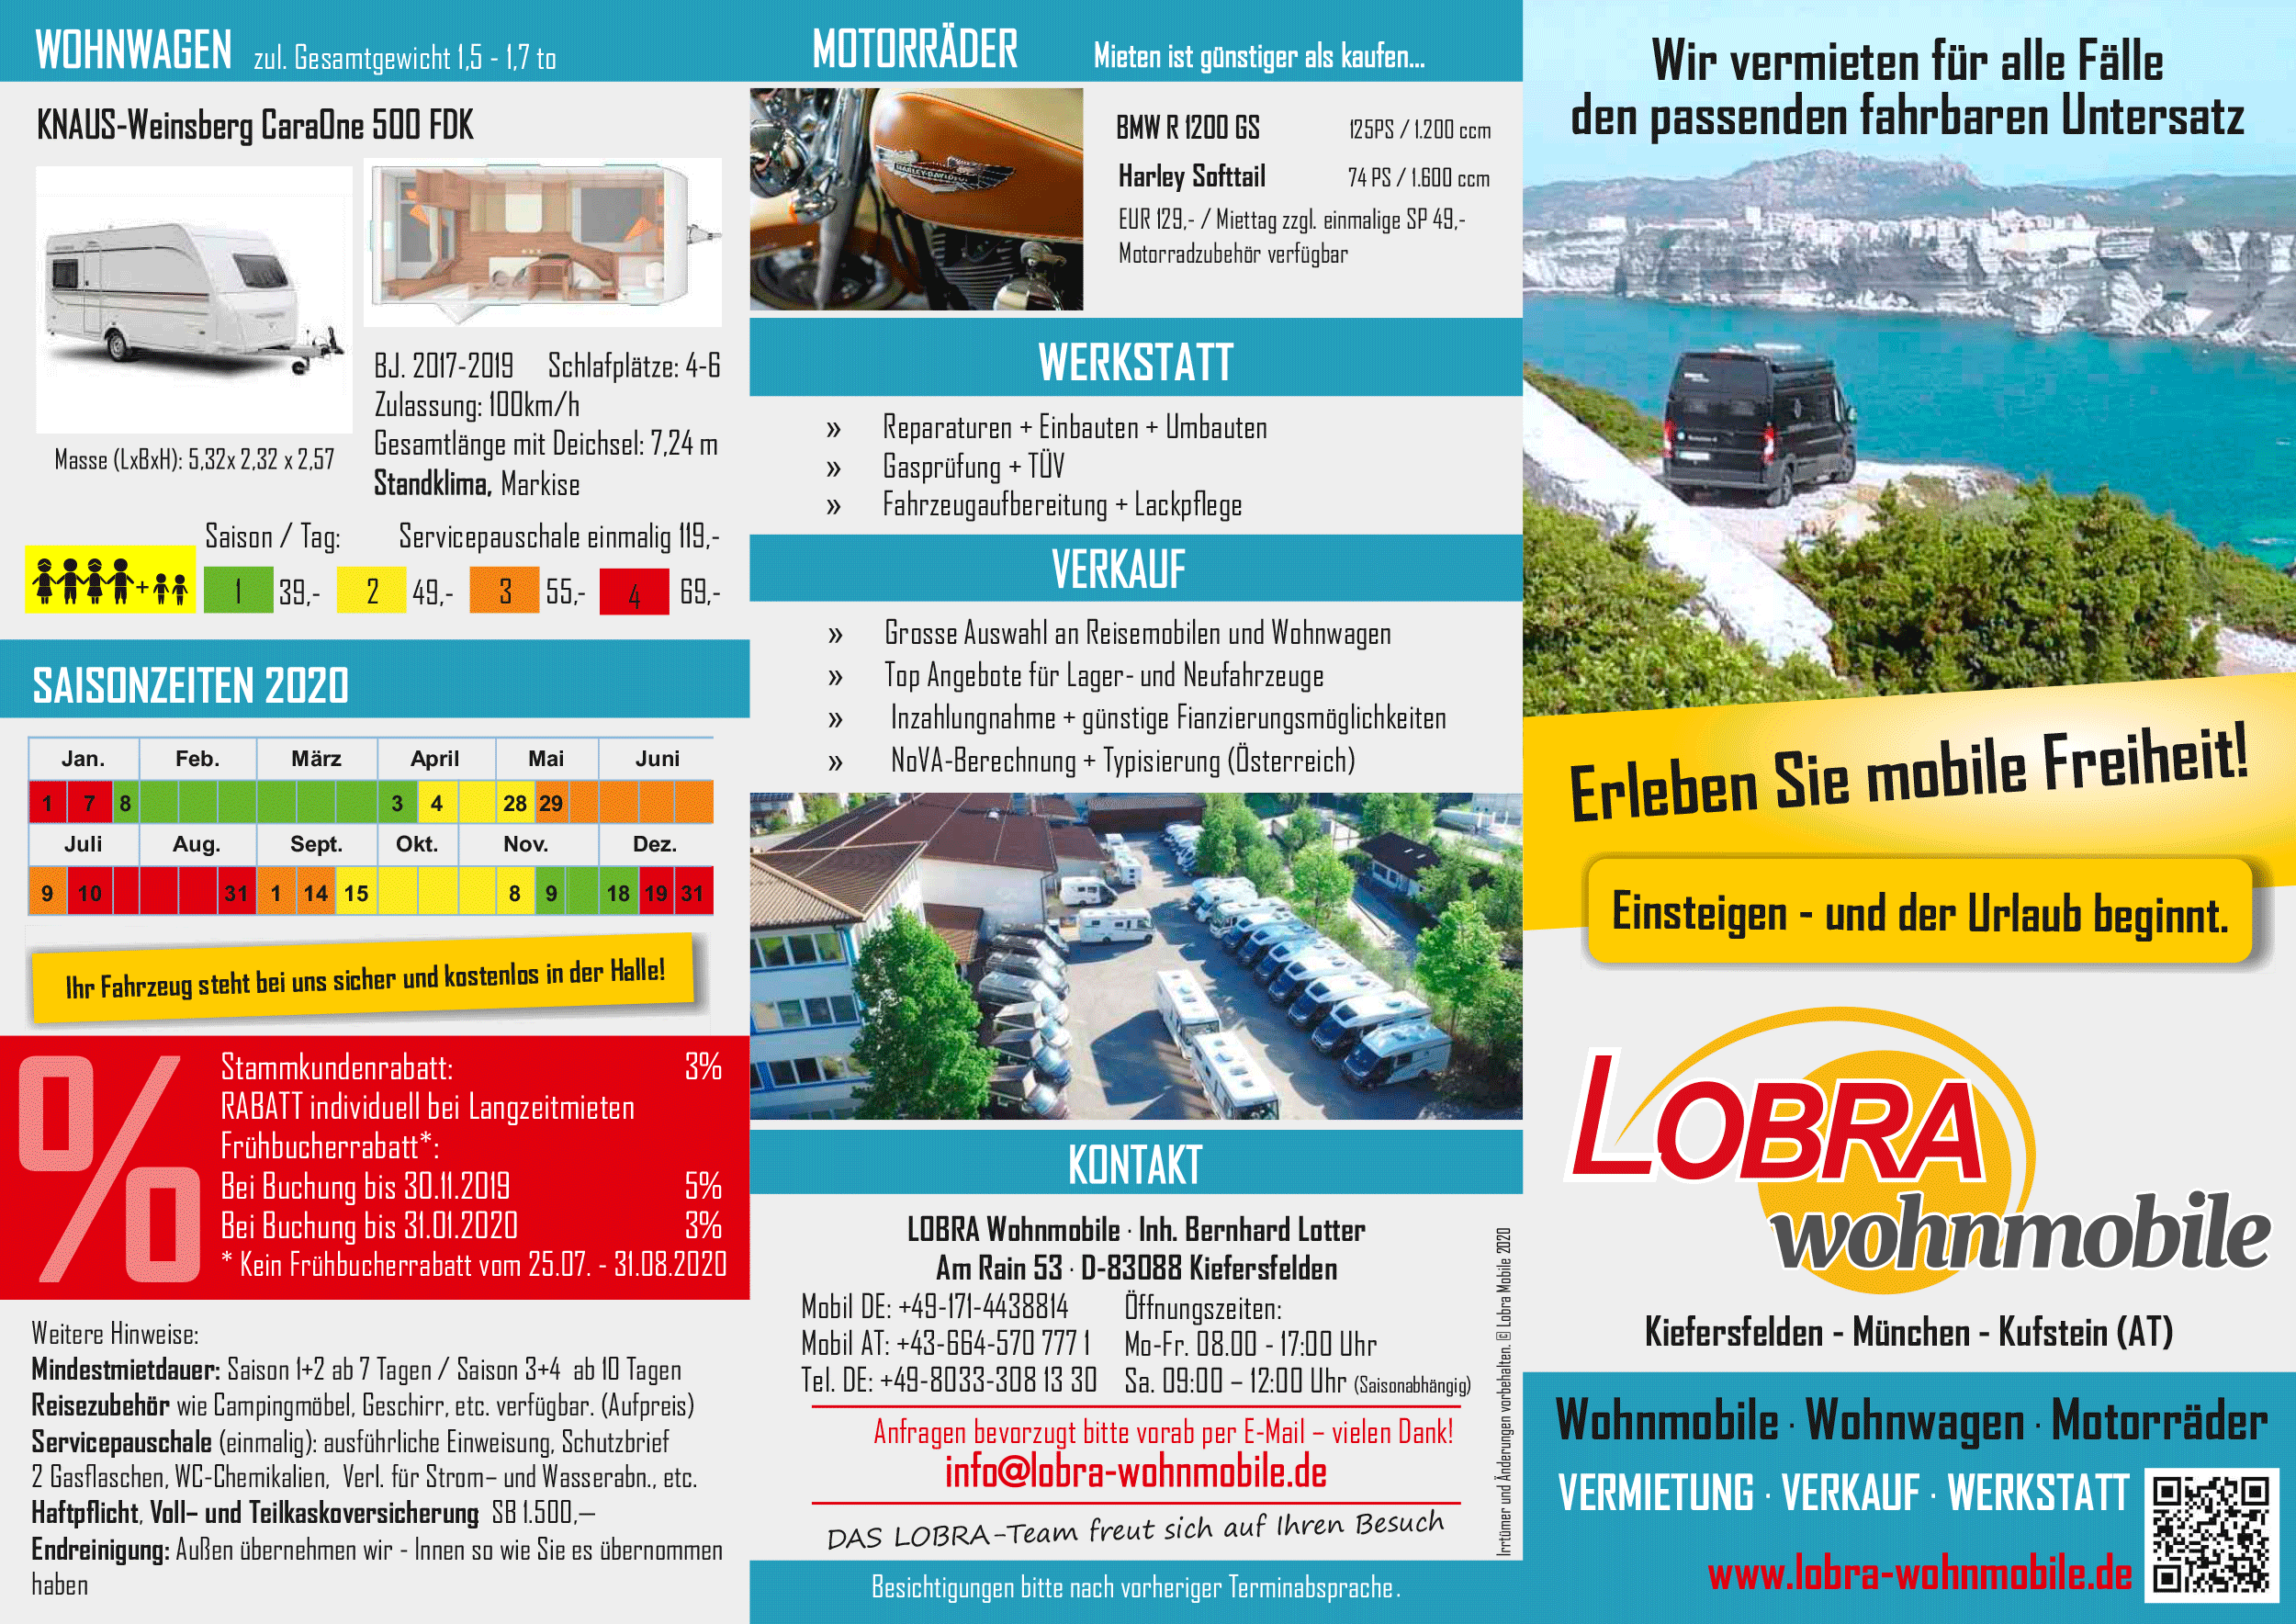 Preisliste LOBRA Wohnmobile 2020